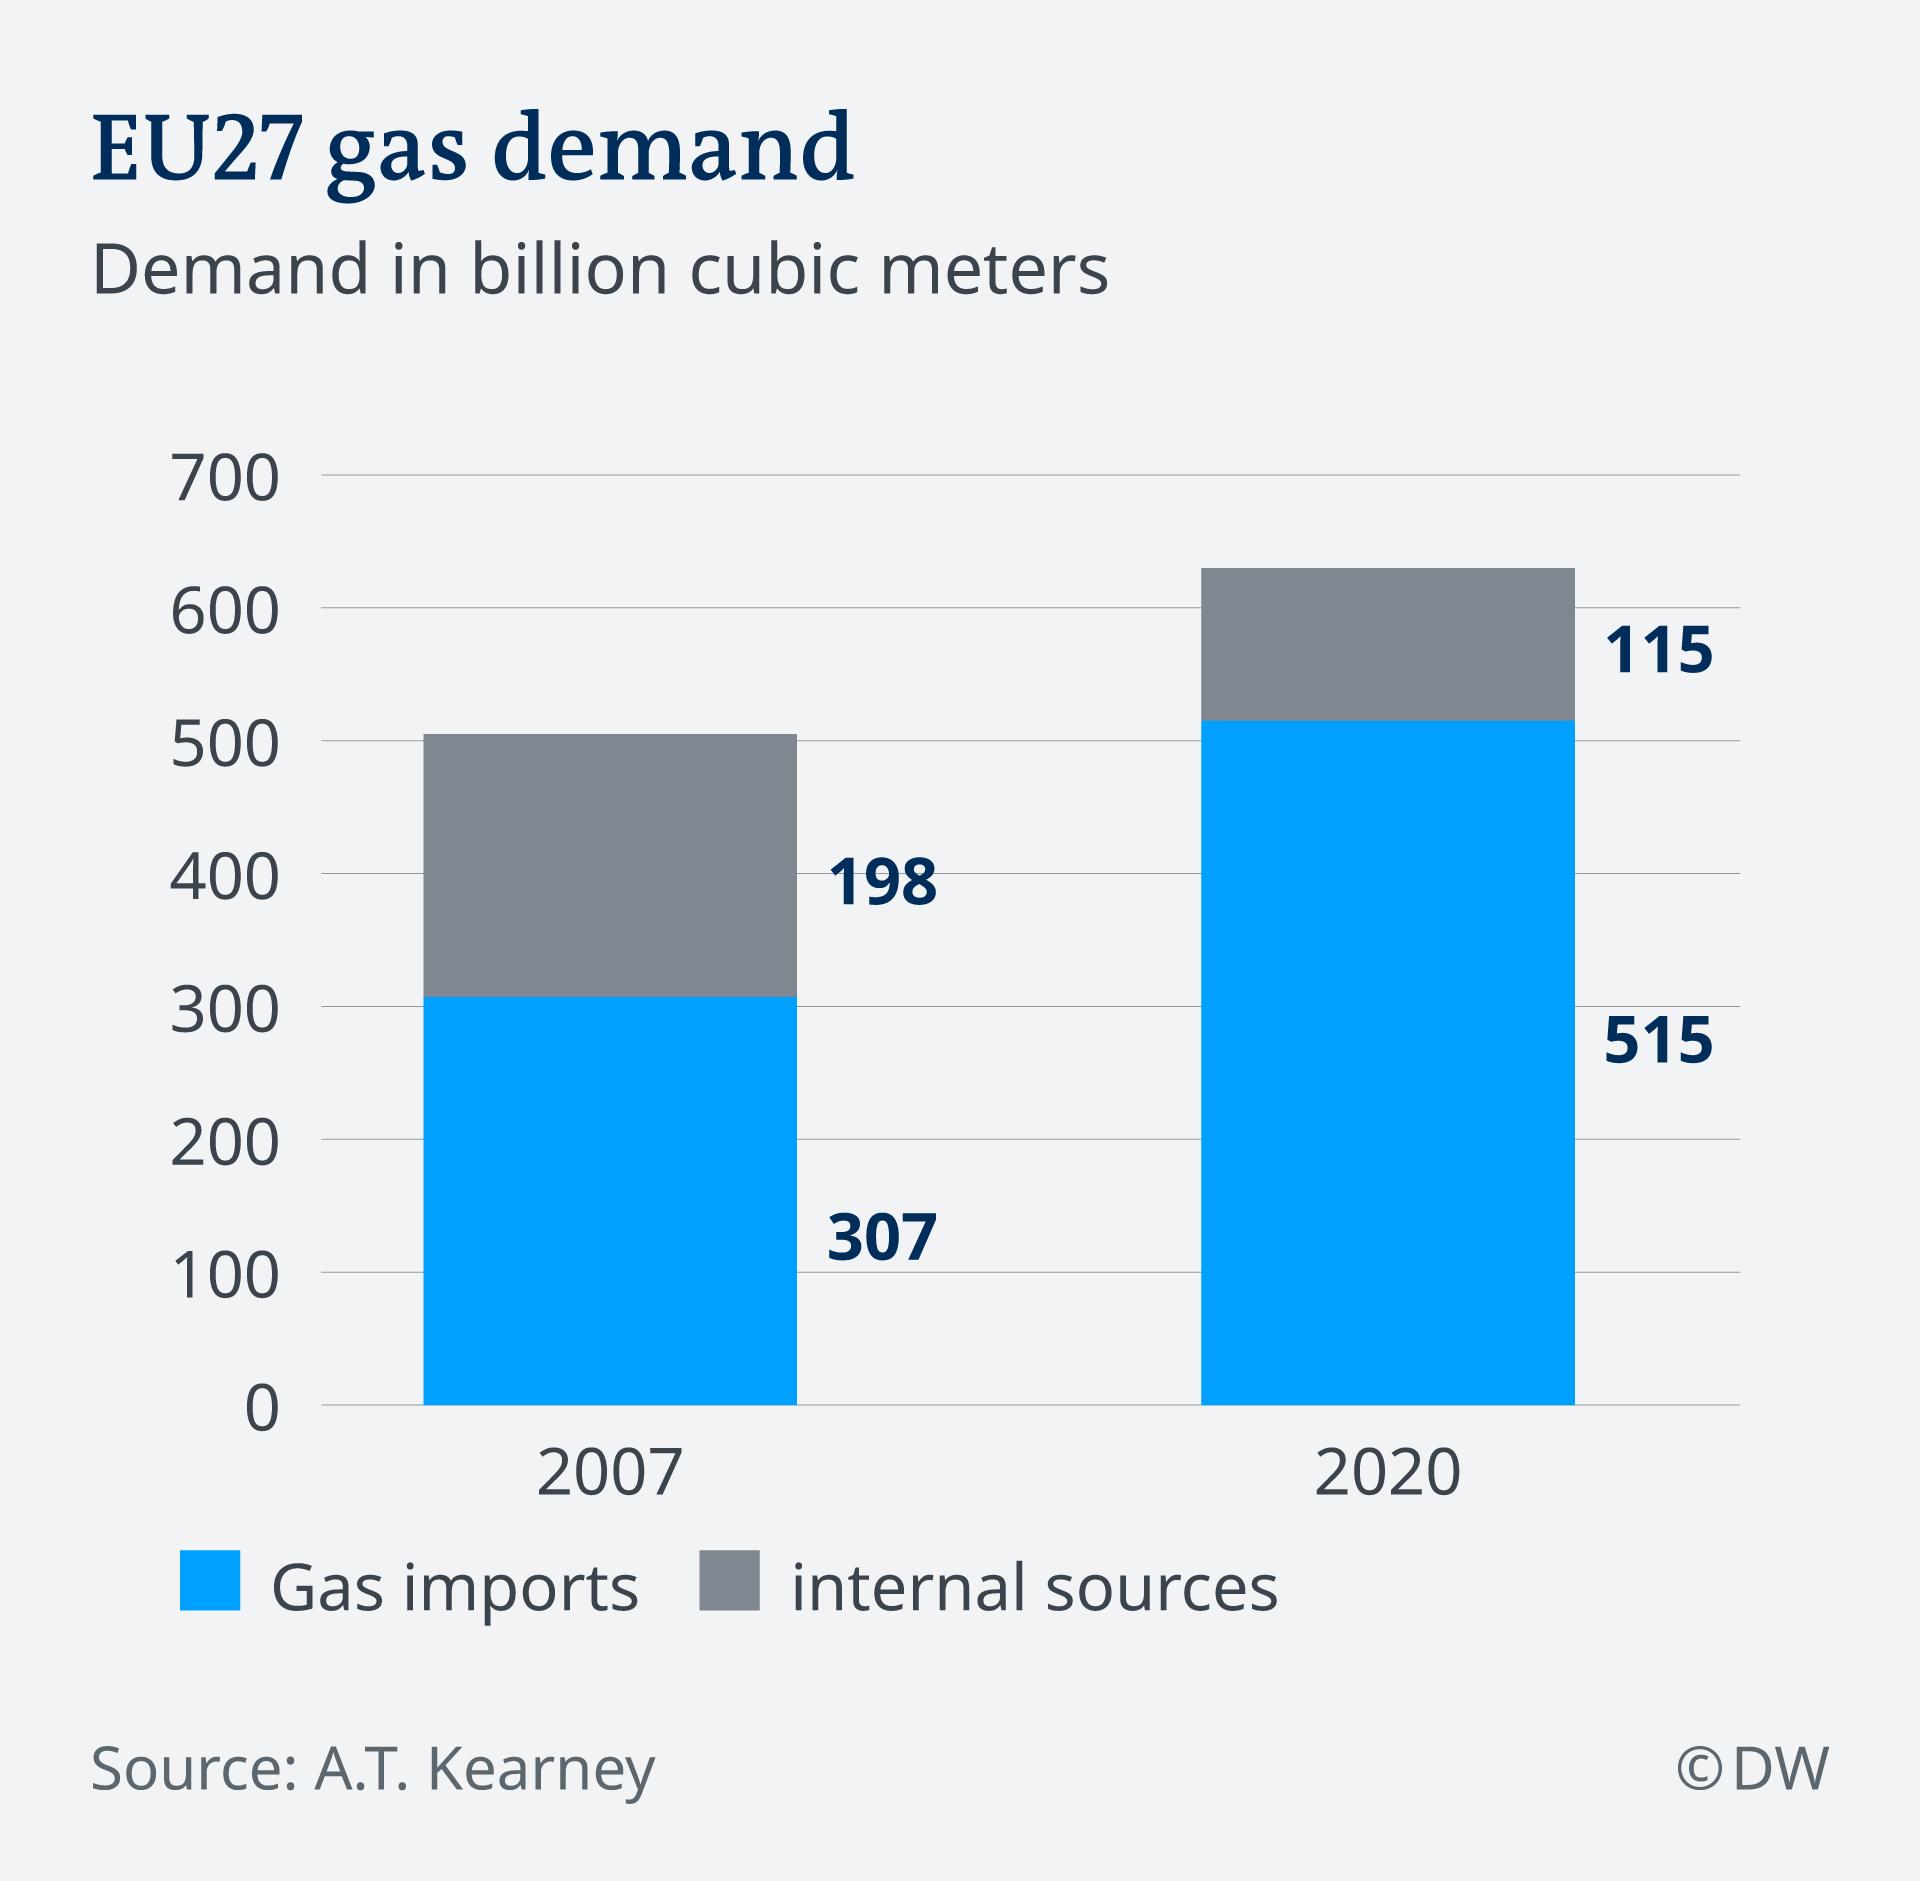 EU27 gas demand projection